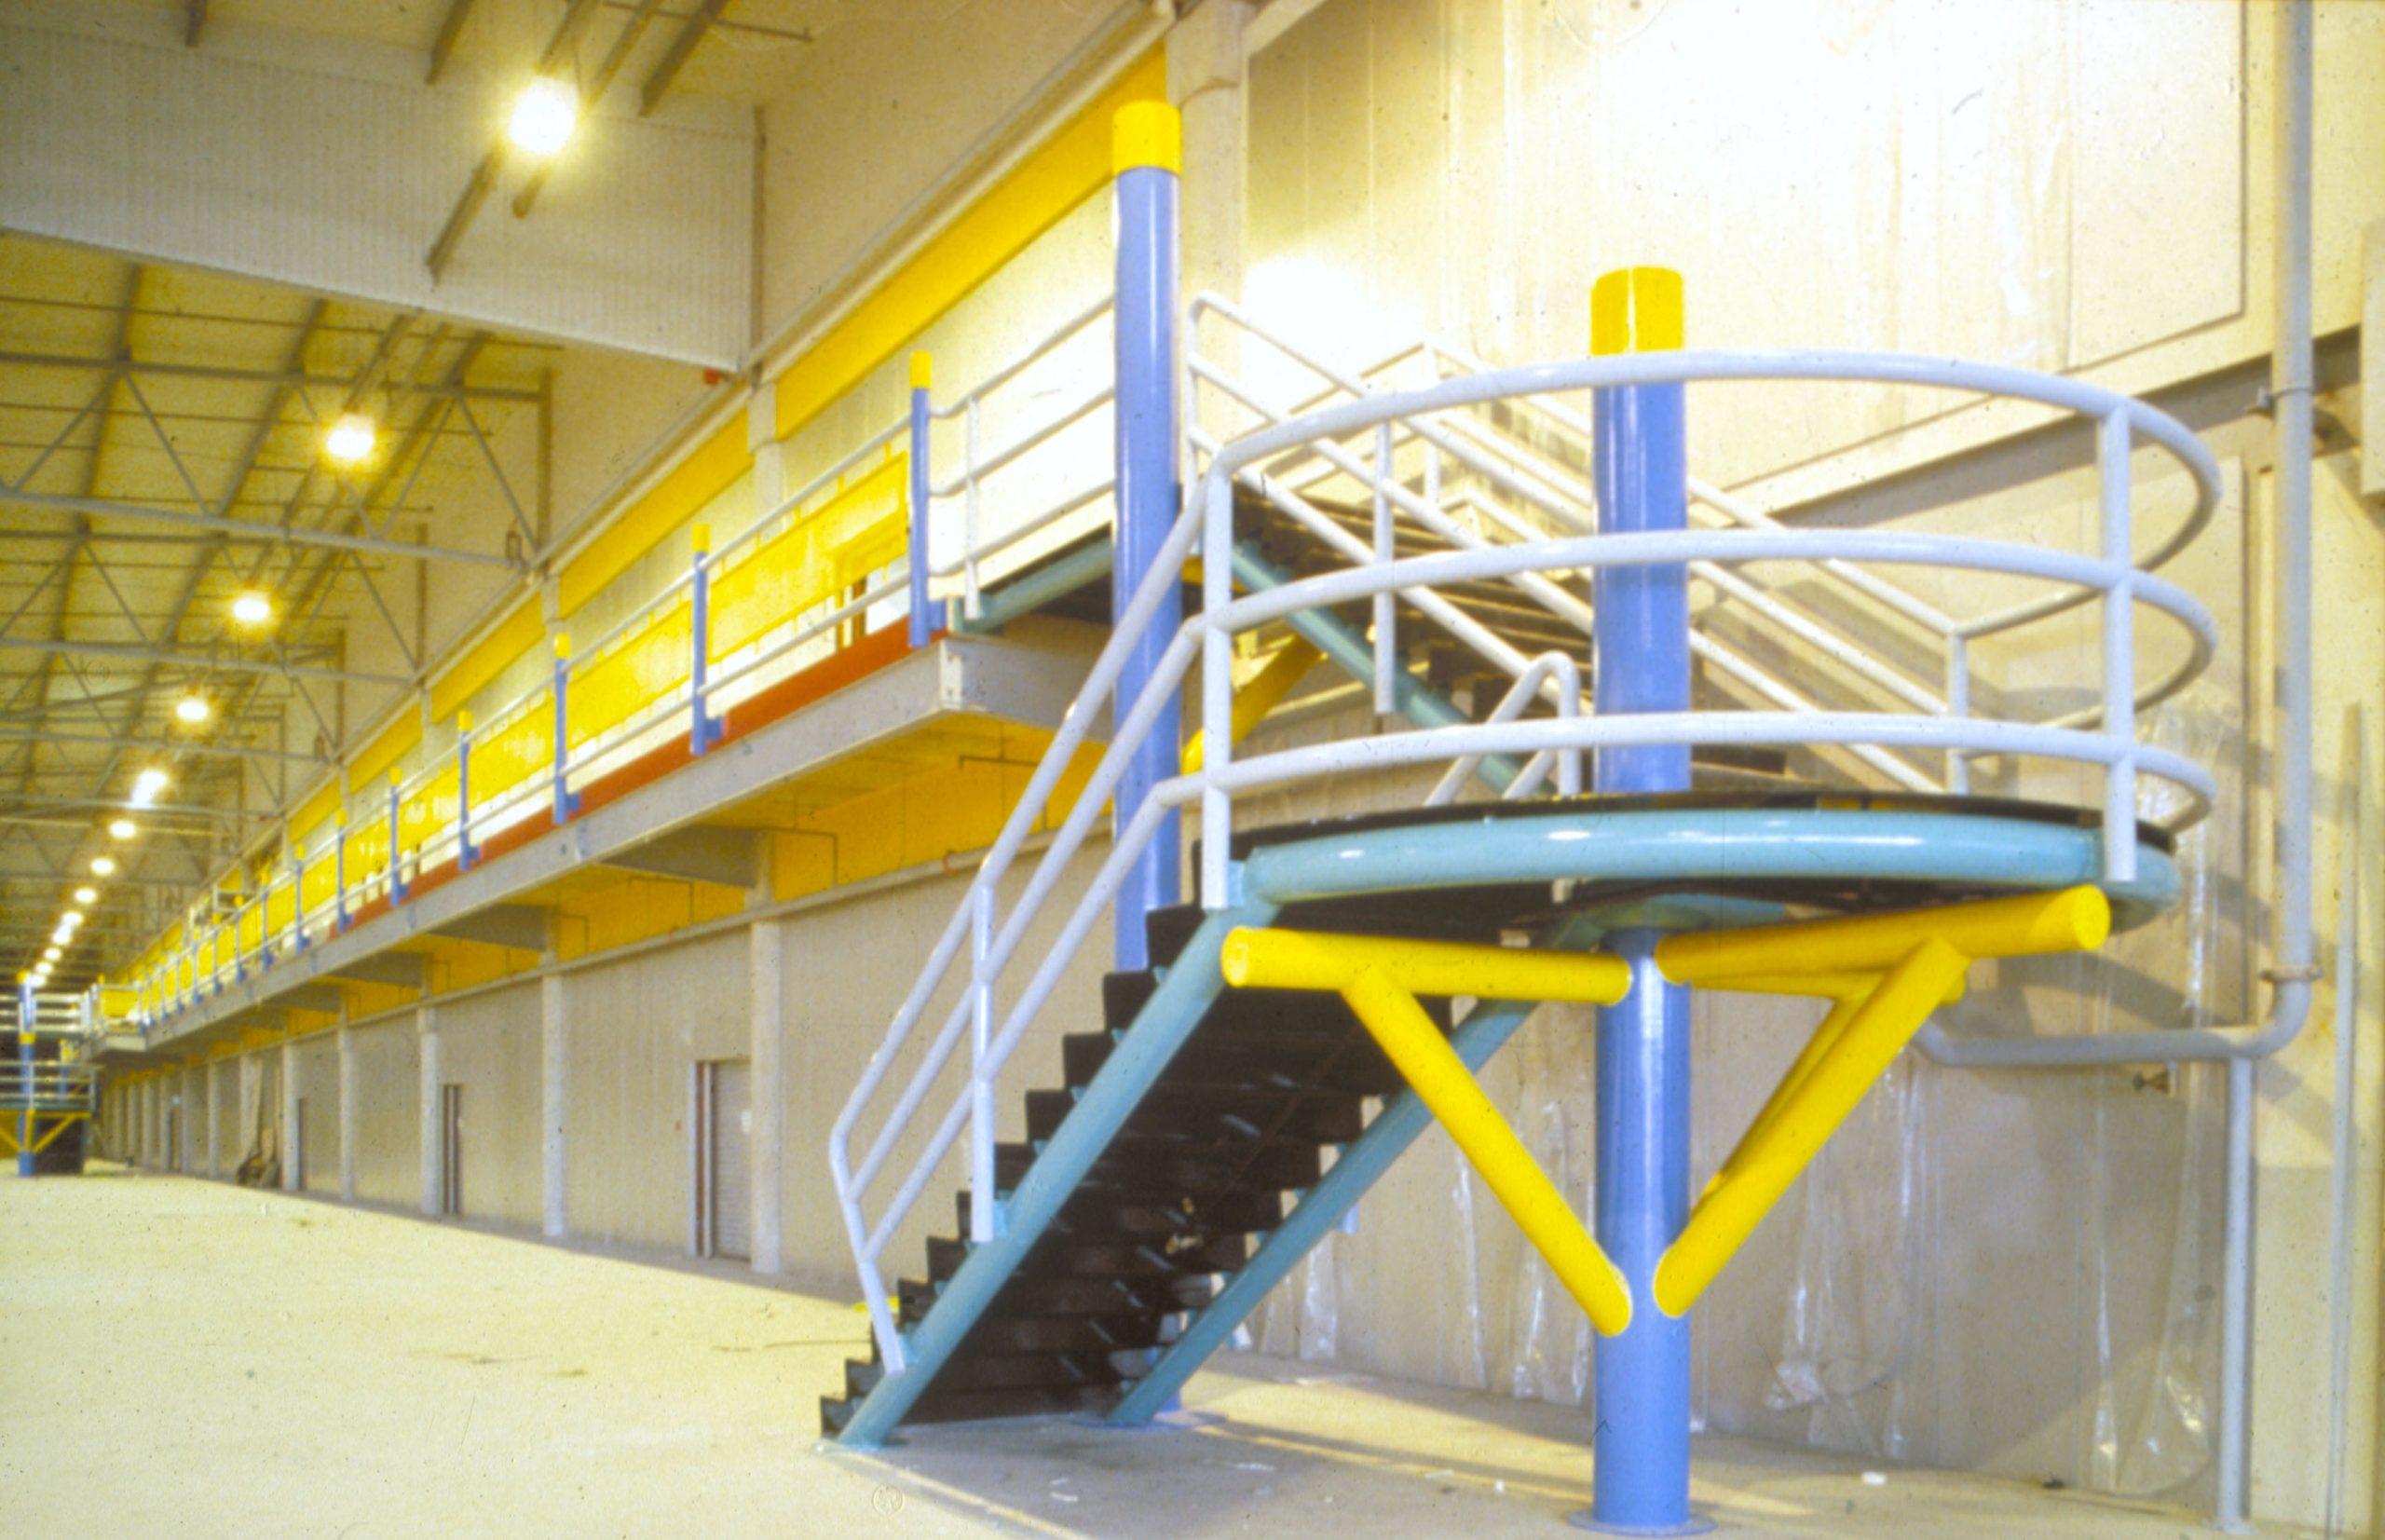 Usine Grattan Bradford GB-coloration intérieure- arch Ian Singleton